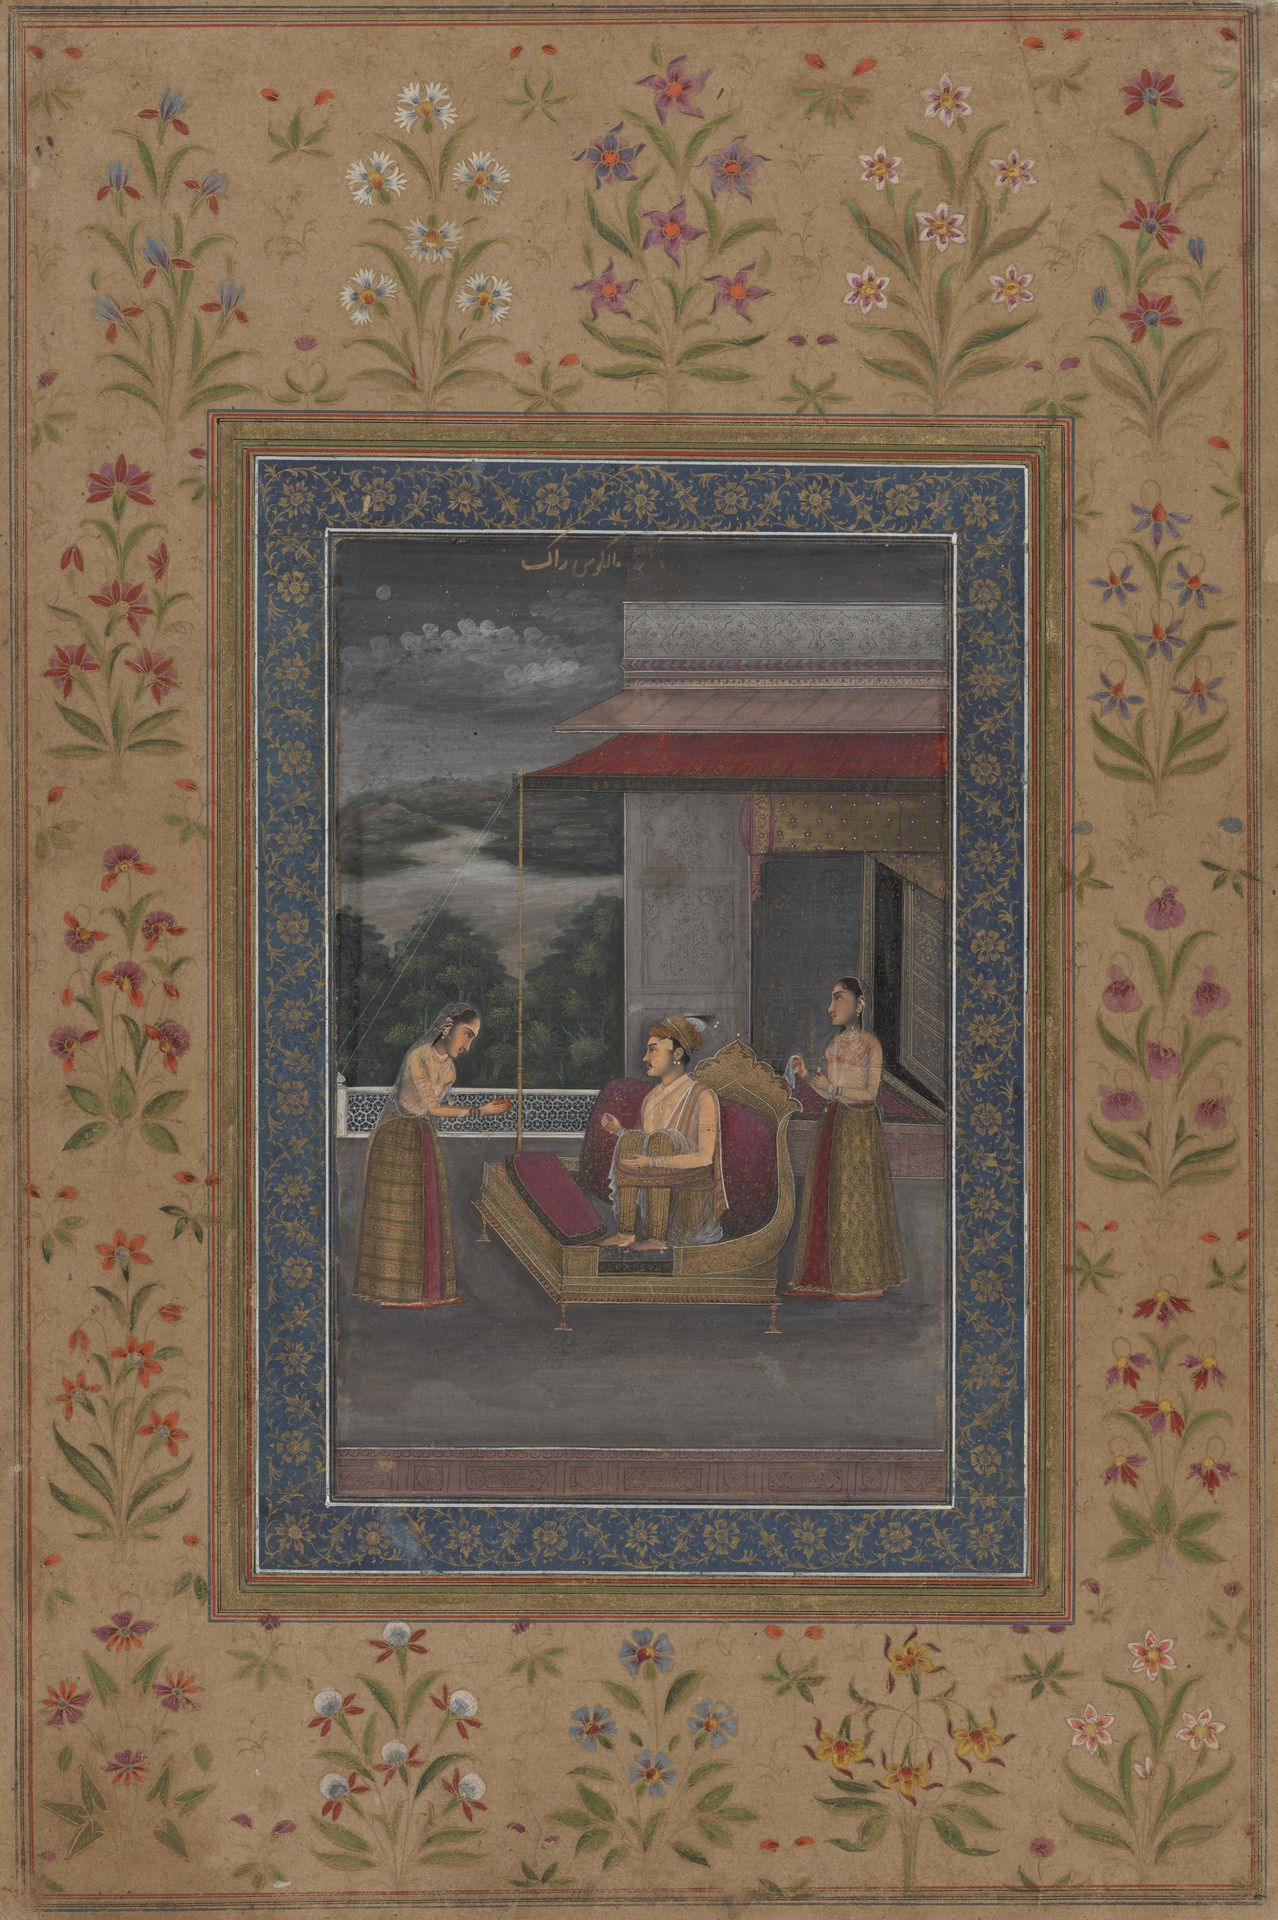 Illustration To A Ragamala Raga Malkauns Opaque Watercolor On